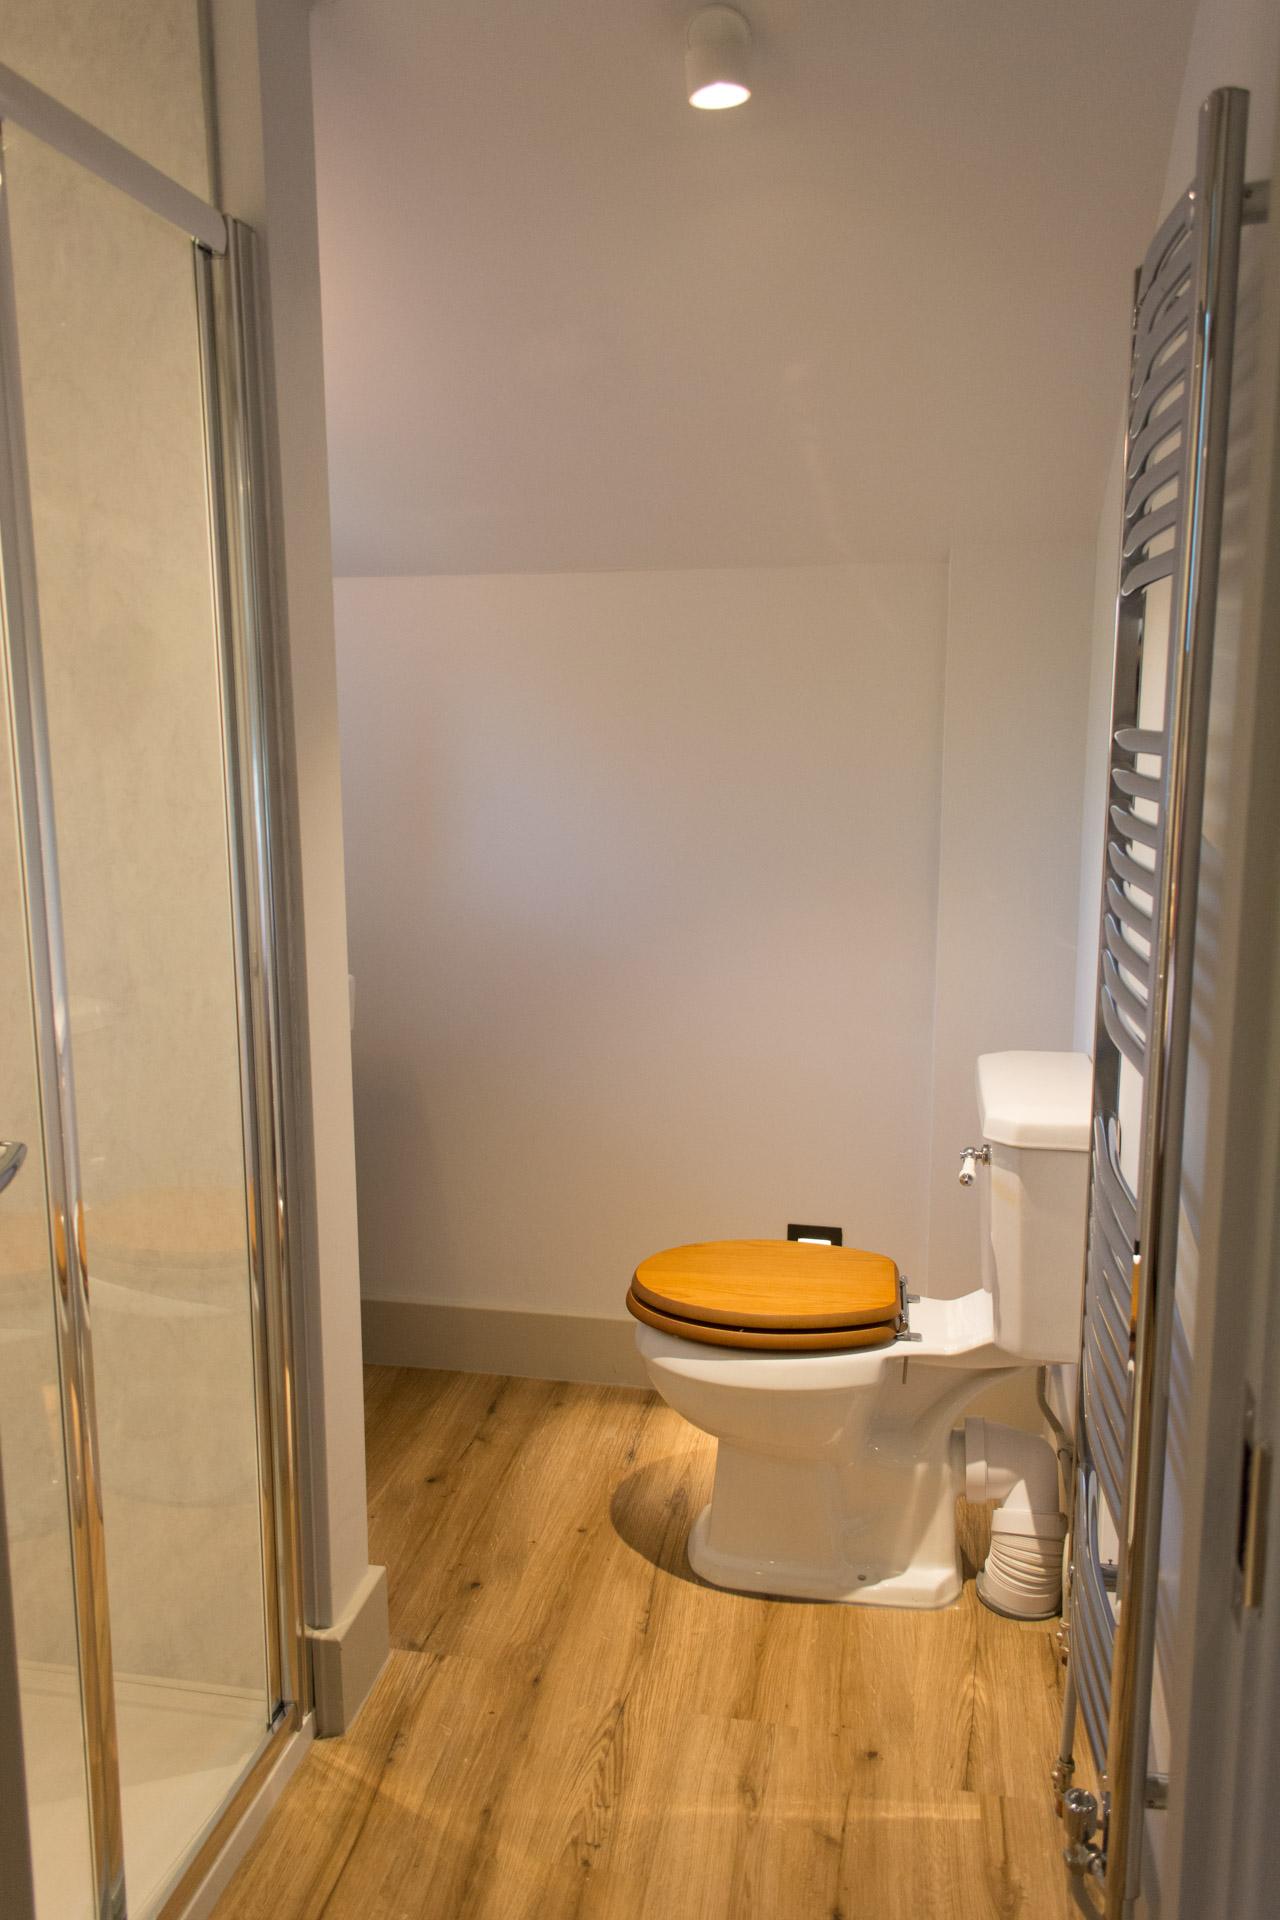 Boathouse Barn toilet.